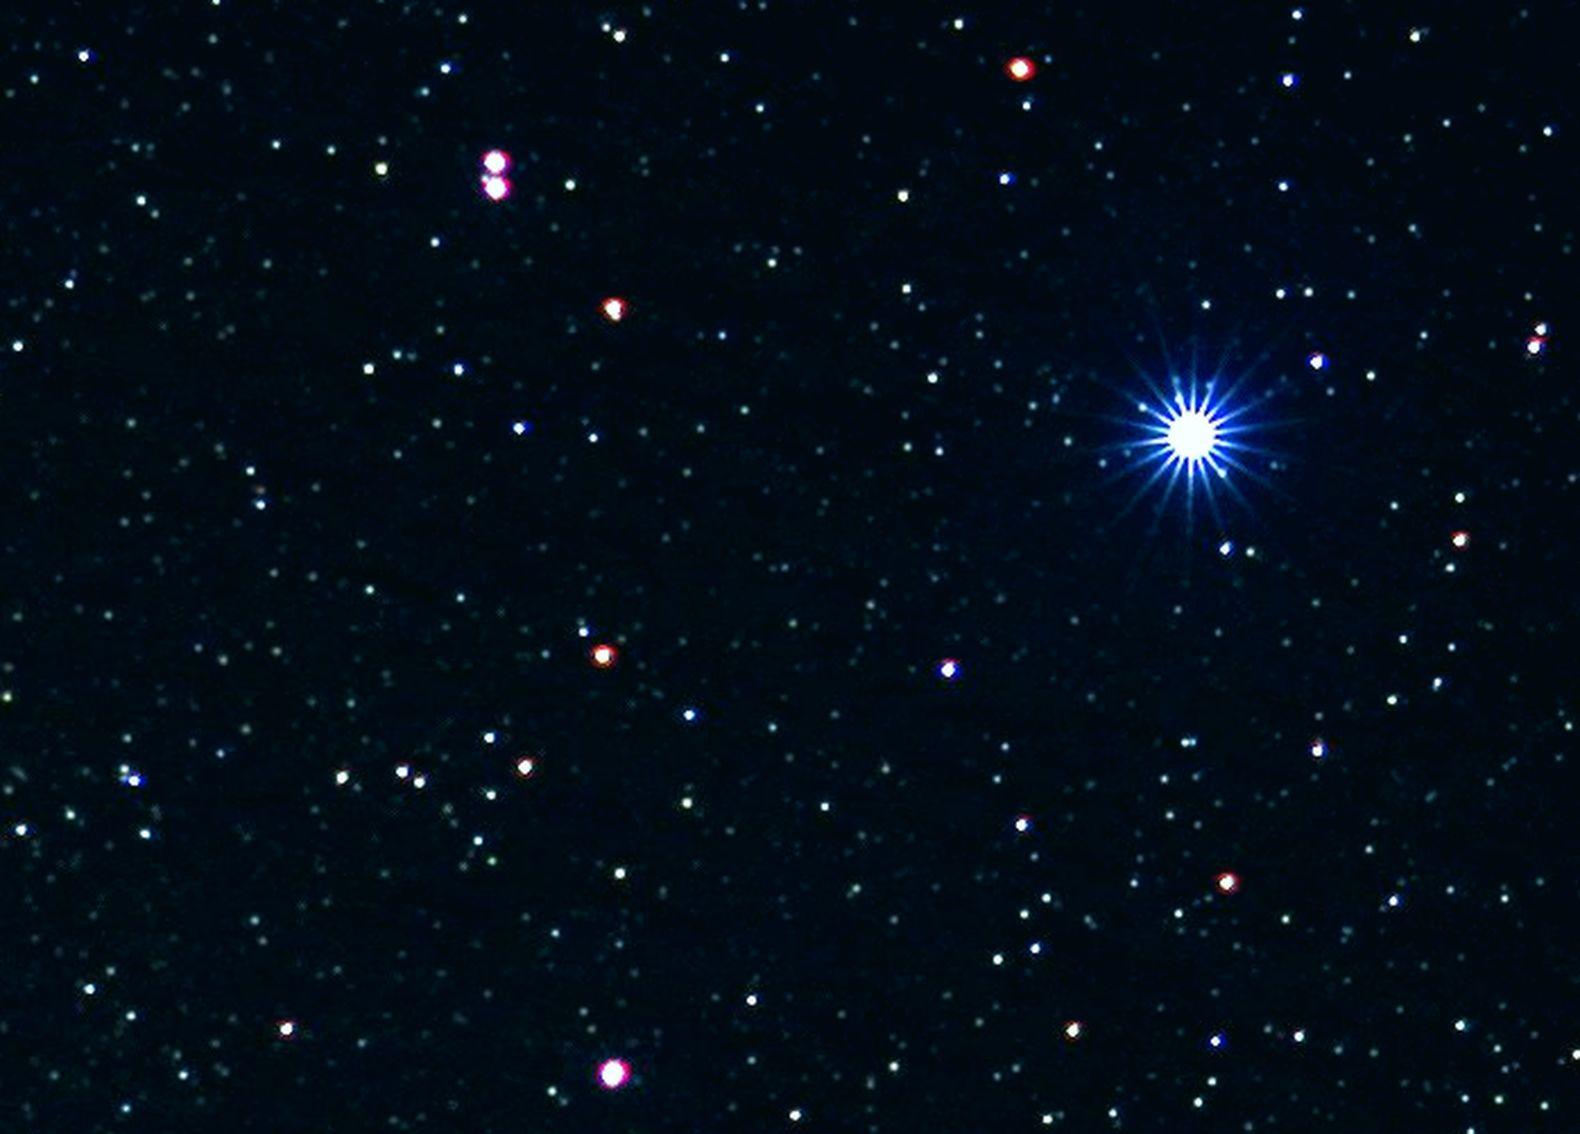 vega star to earth - photo #17